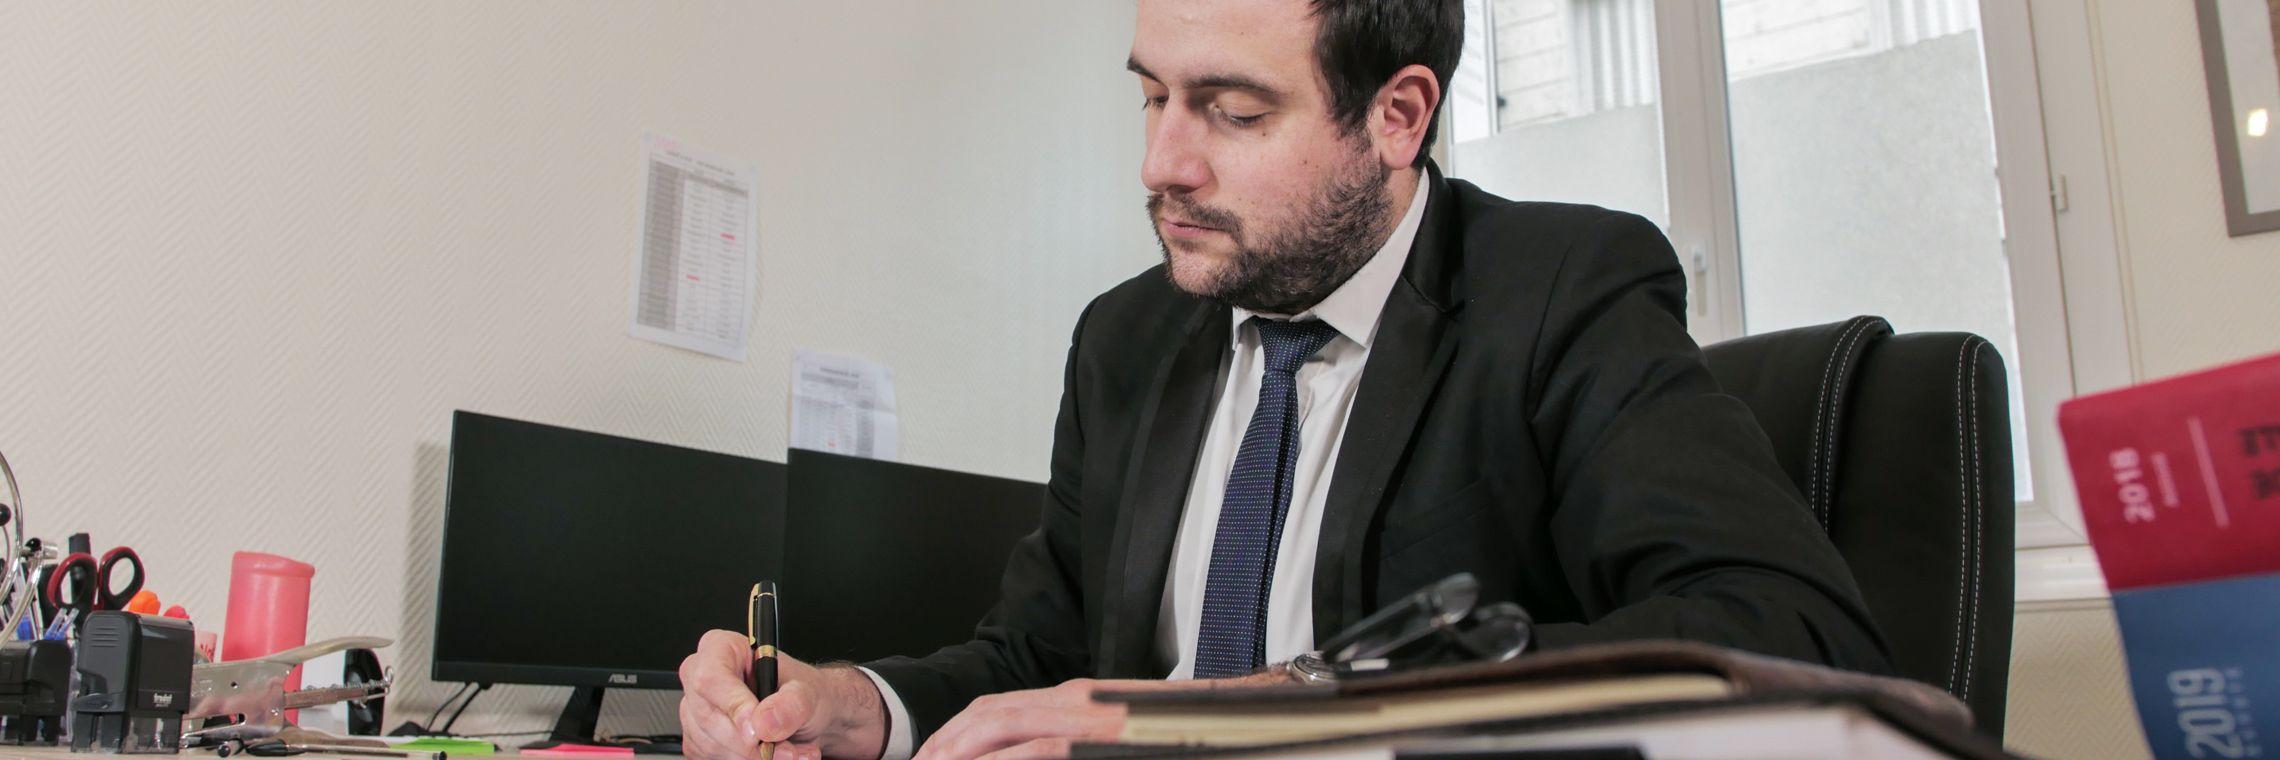 Maître Anthony ALEXANDRE